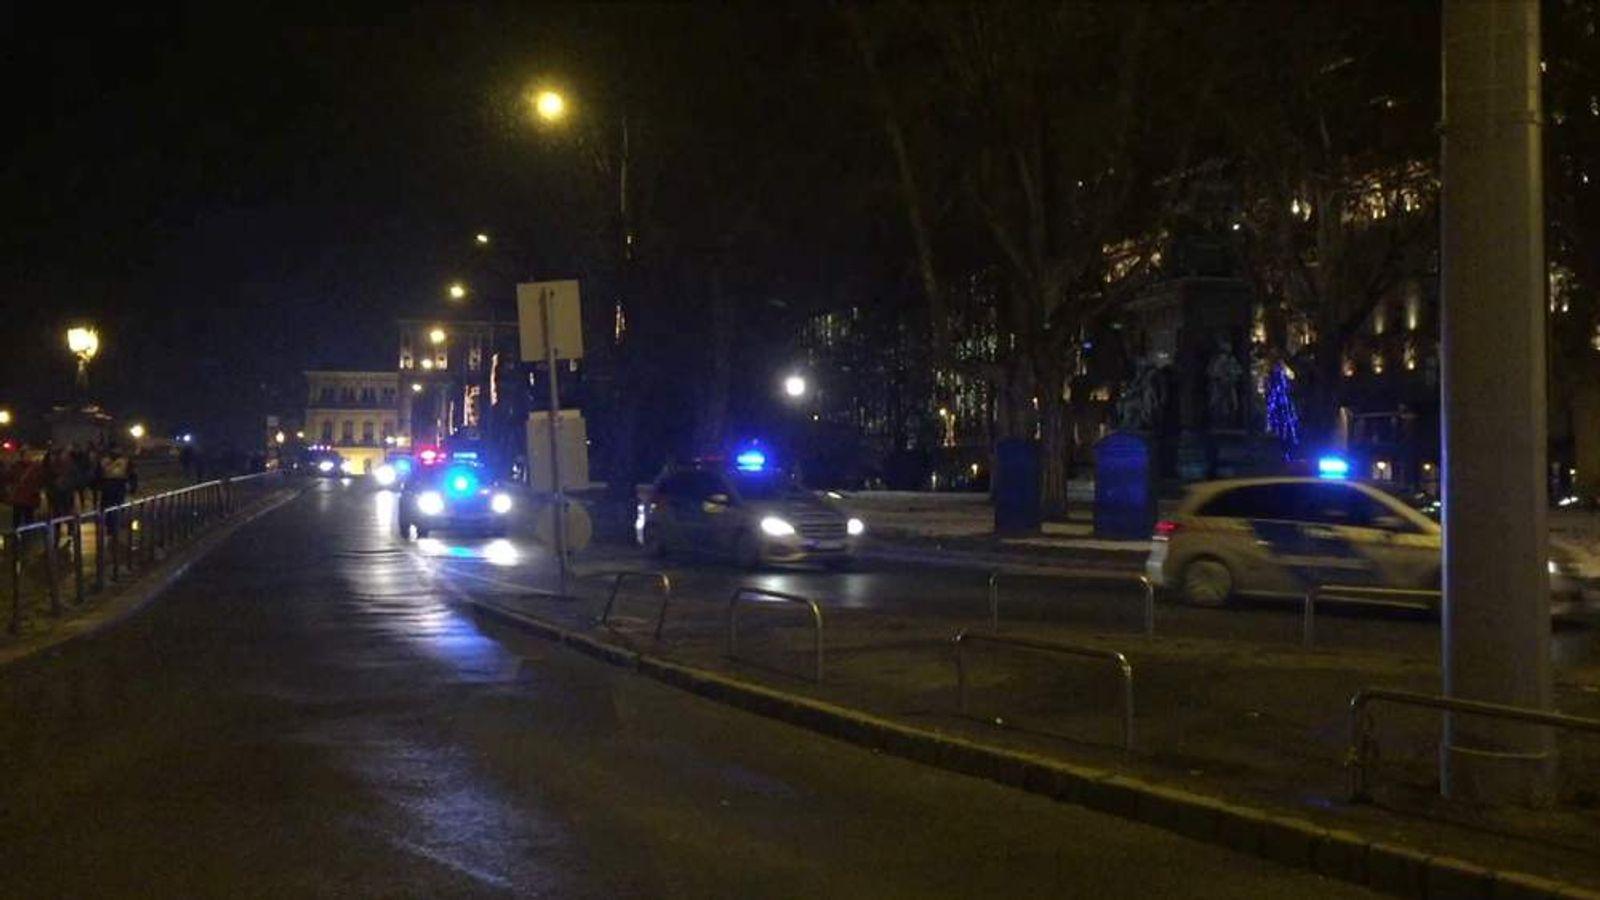 David Cameron's motorcade travels through the centre of Budapest